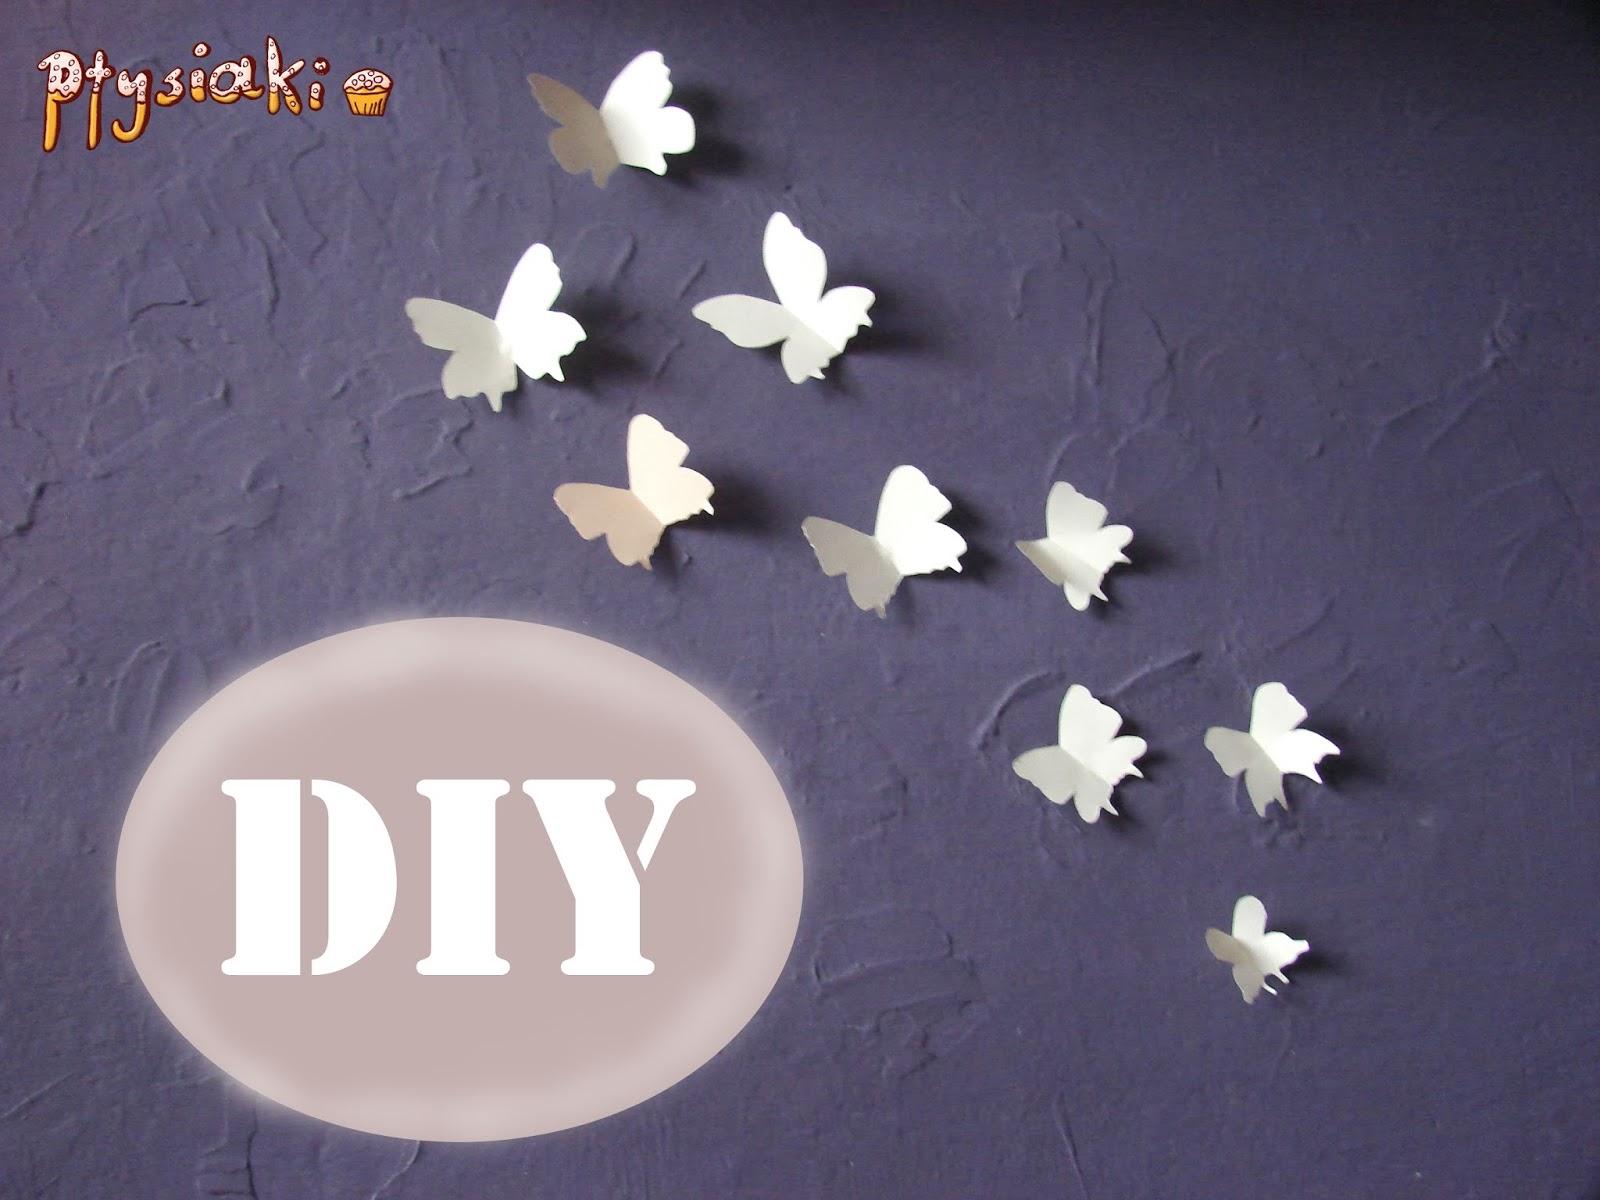 http://ptysiaki.blogspot.com/2014/03/diy-motylki-na-sciane.html